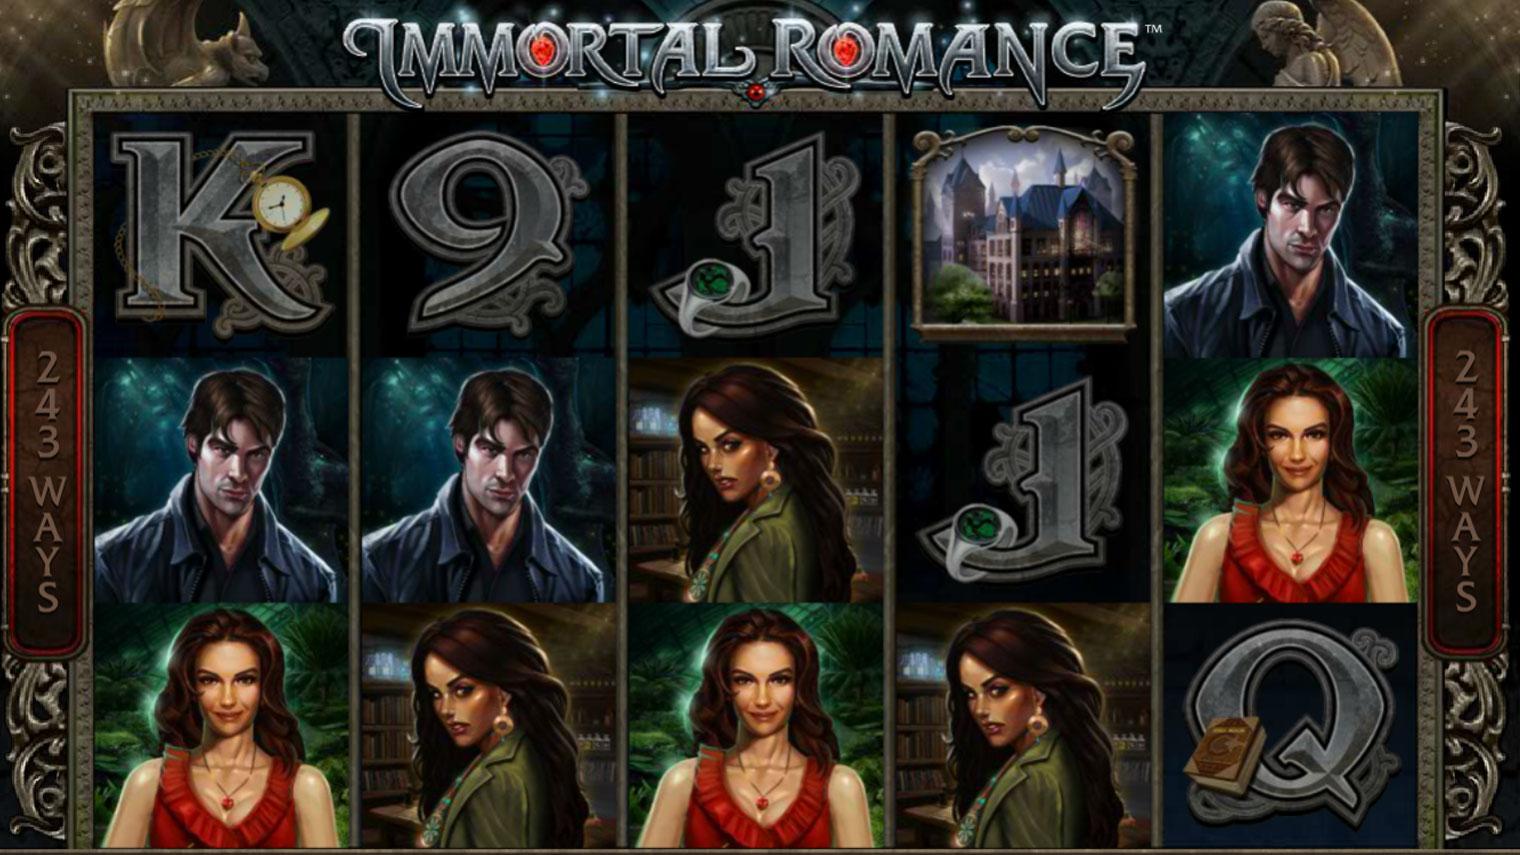 Immortal romance Slot Machine - How to Play